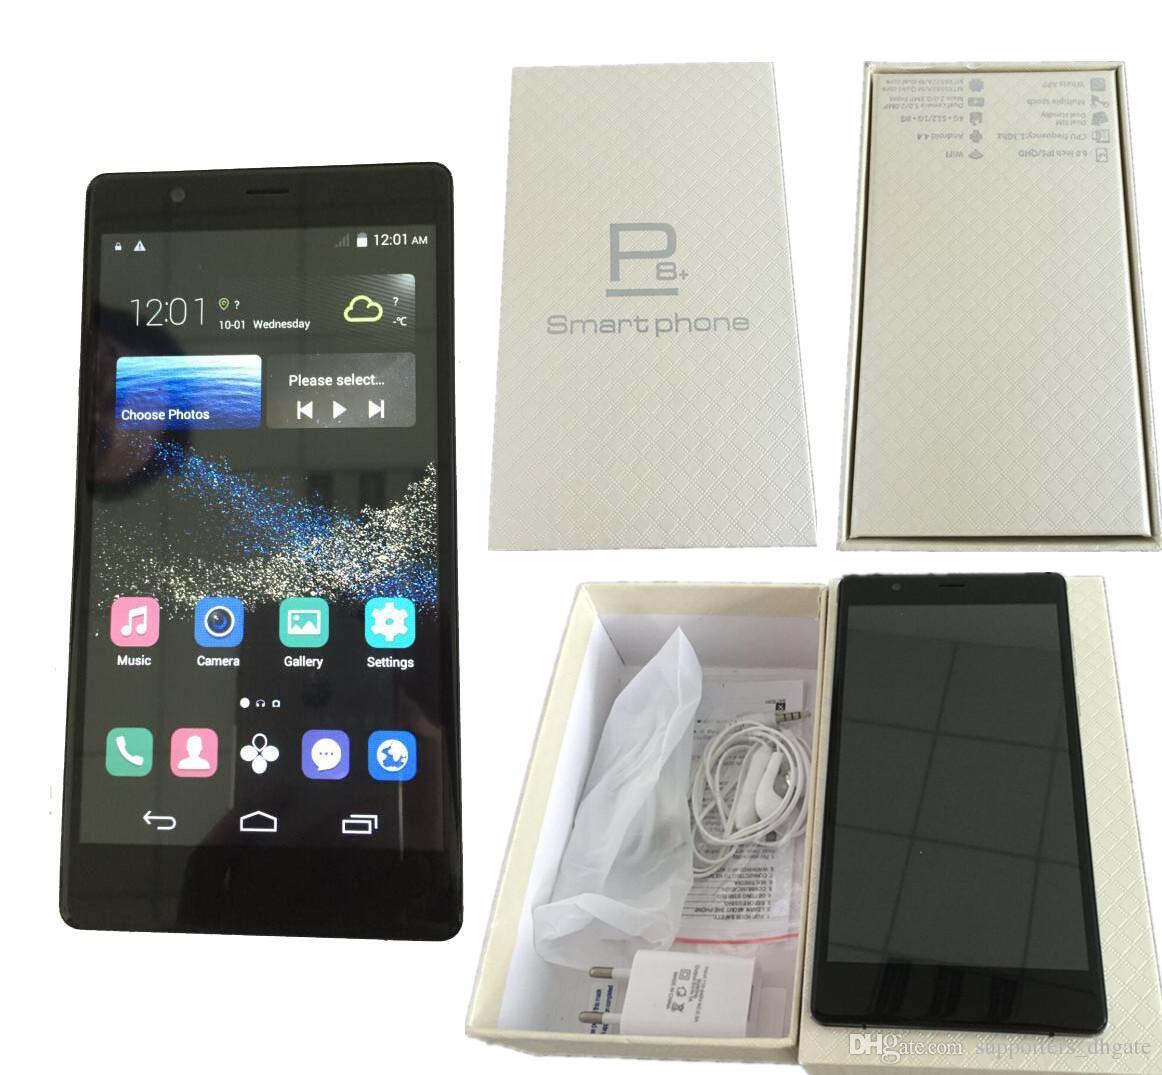 Huawei p8 artı telefon Android 6.0 inç MTK6572 Çift çekirdekli smartphone cep telefonları çift Sim 512 RAM 4 GB ROM gösterisi 32 GB Sahte 4G LTE ücretsiz DHL